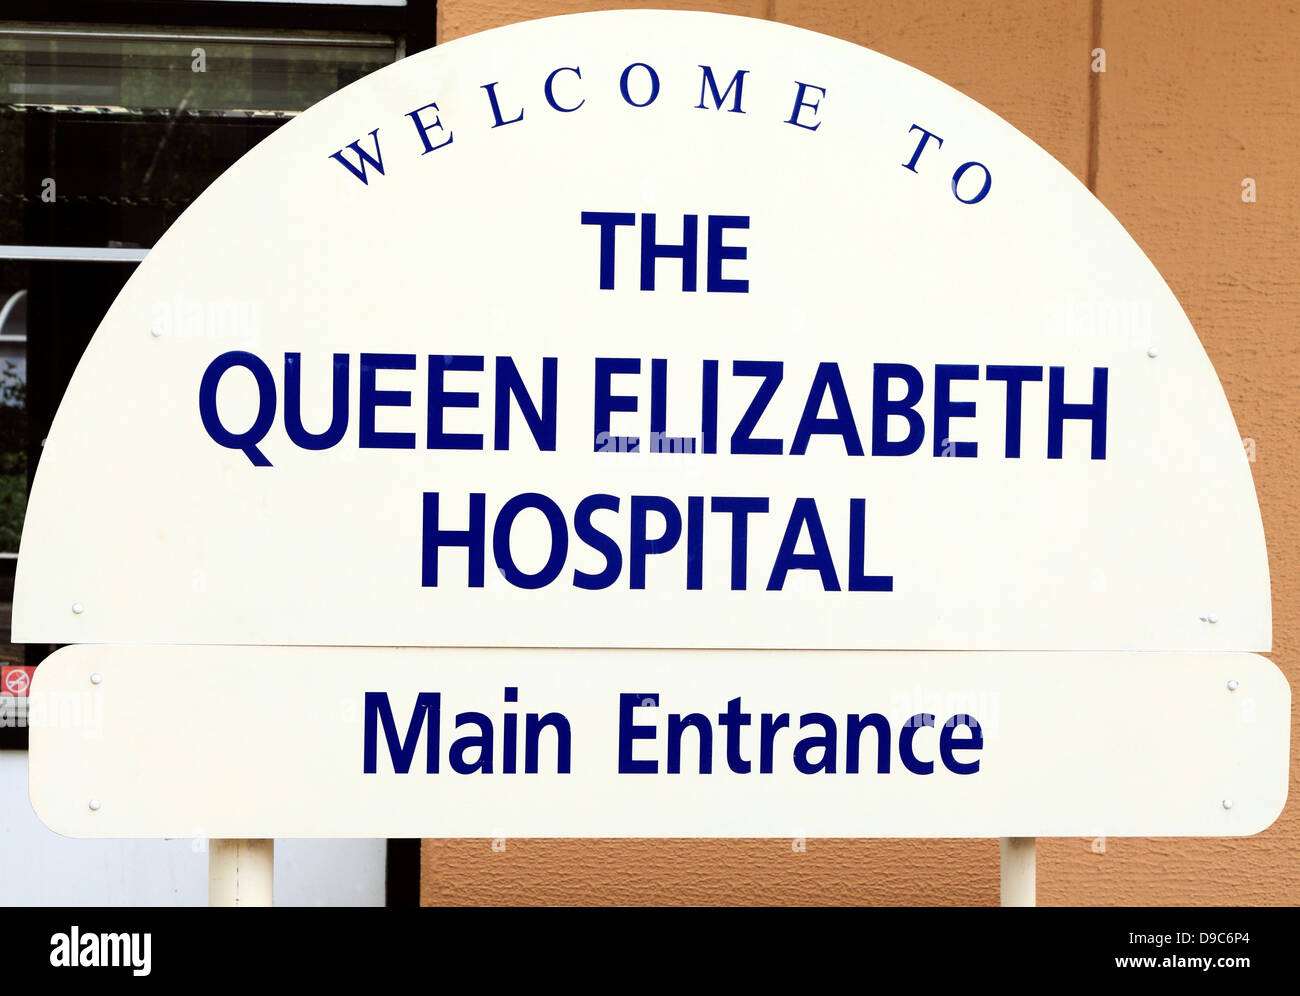 Kings Lynn, Norfolk, Queen Elizabeth Hospital NHS, Main Entrance, England, UK, English hospitals - Stock Image